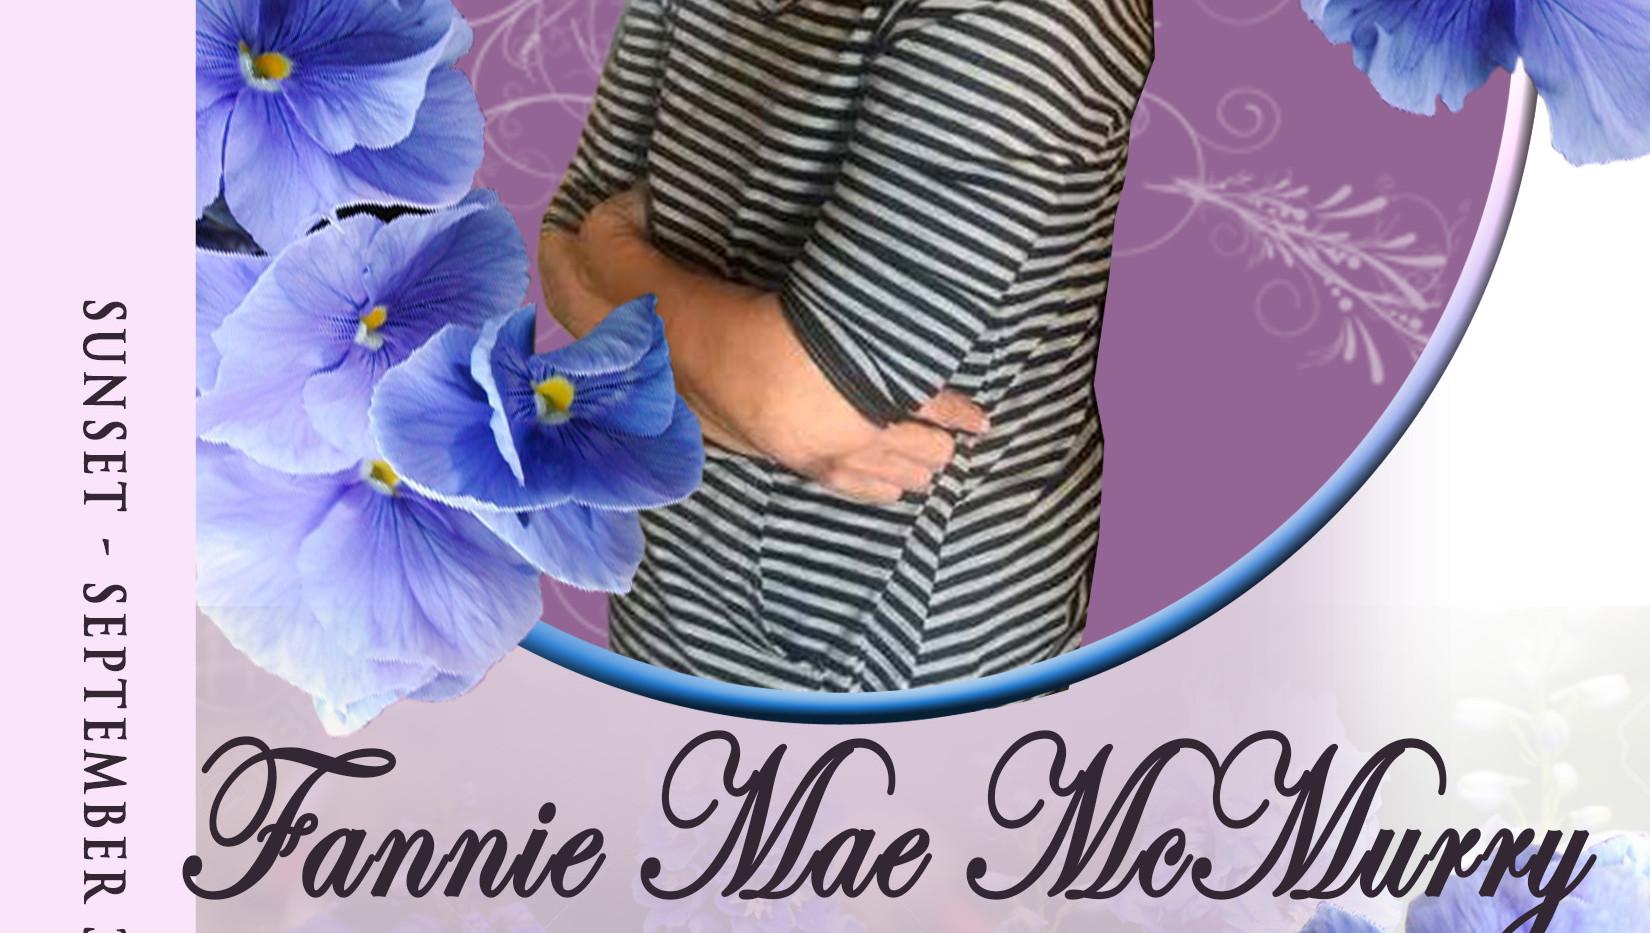 Fannie Mae McMurry Obit Cover.jpg